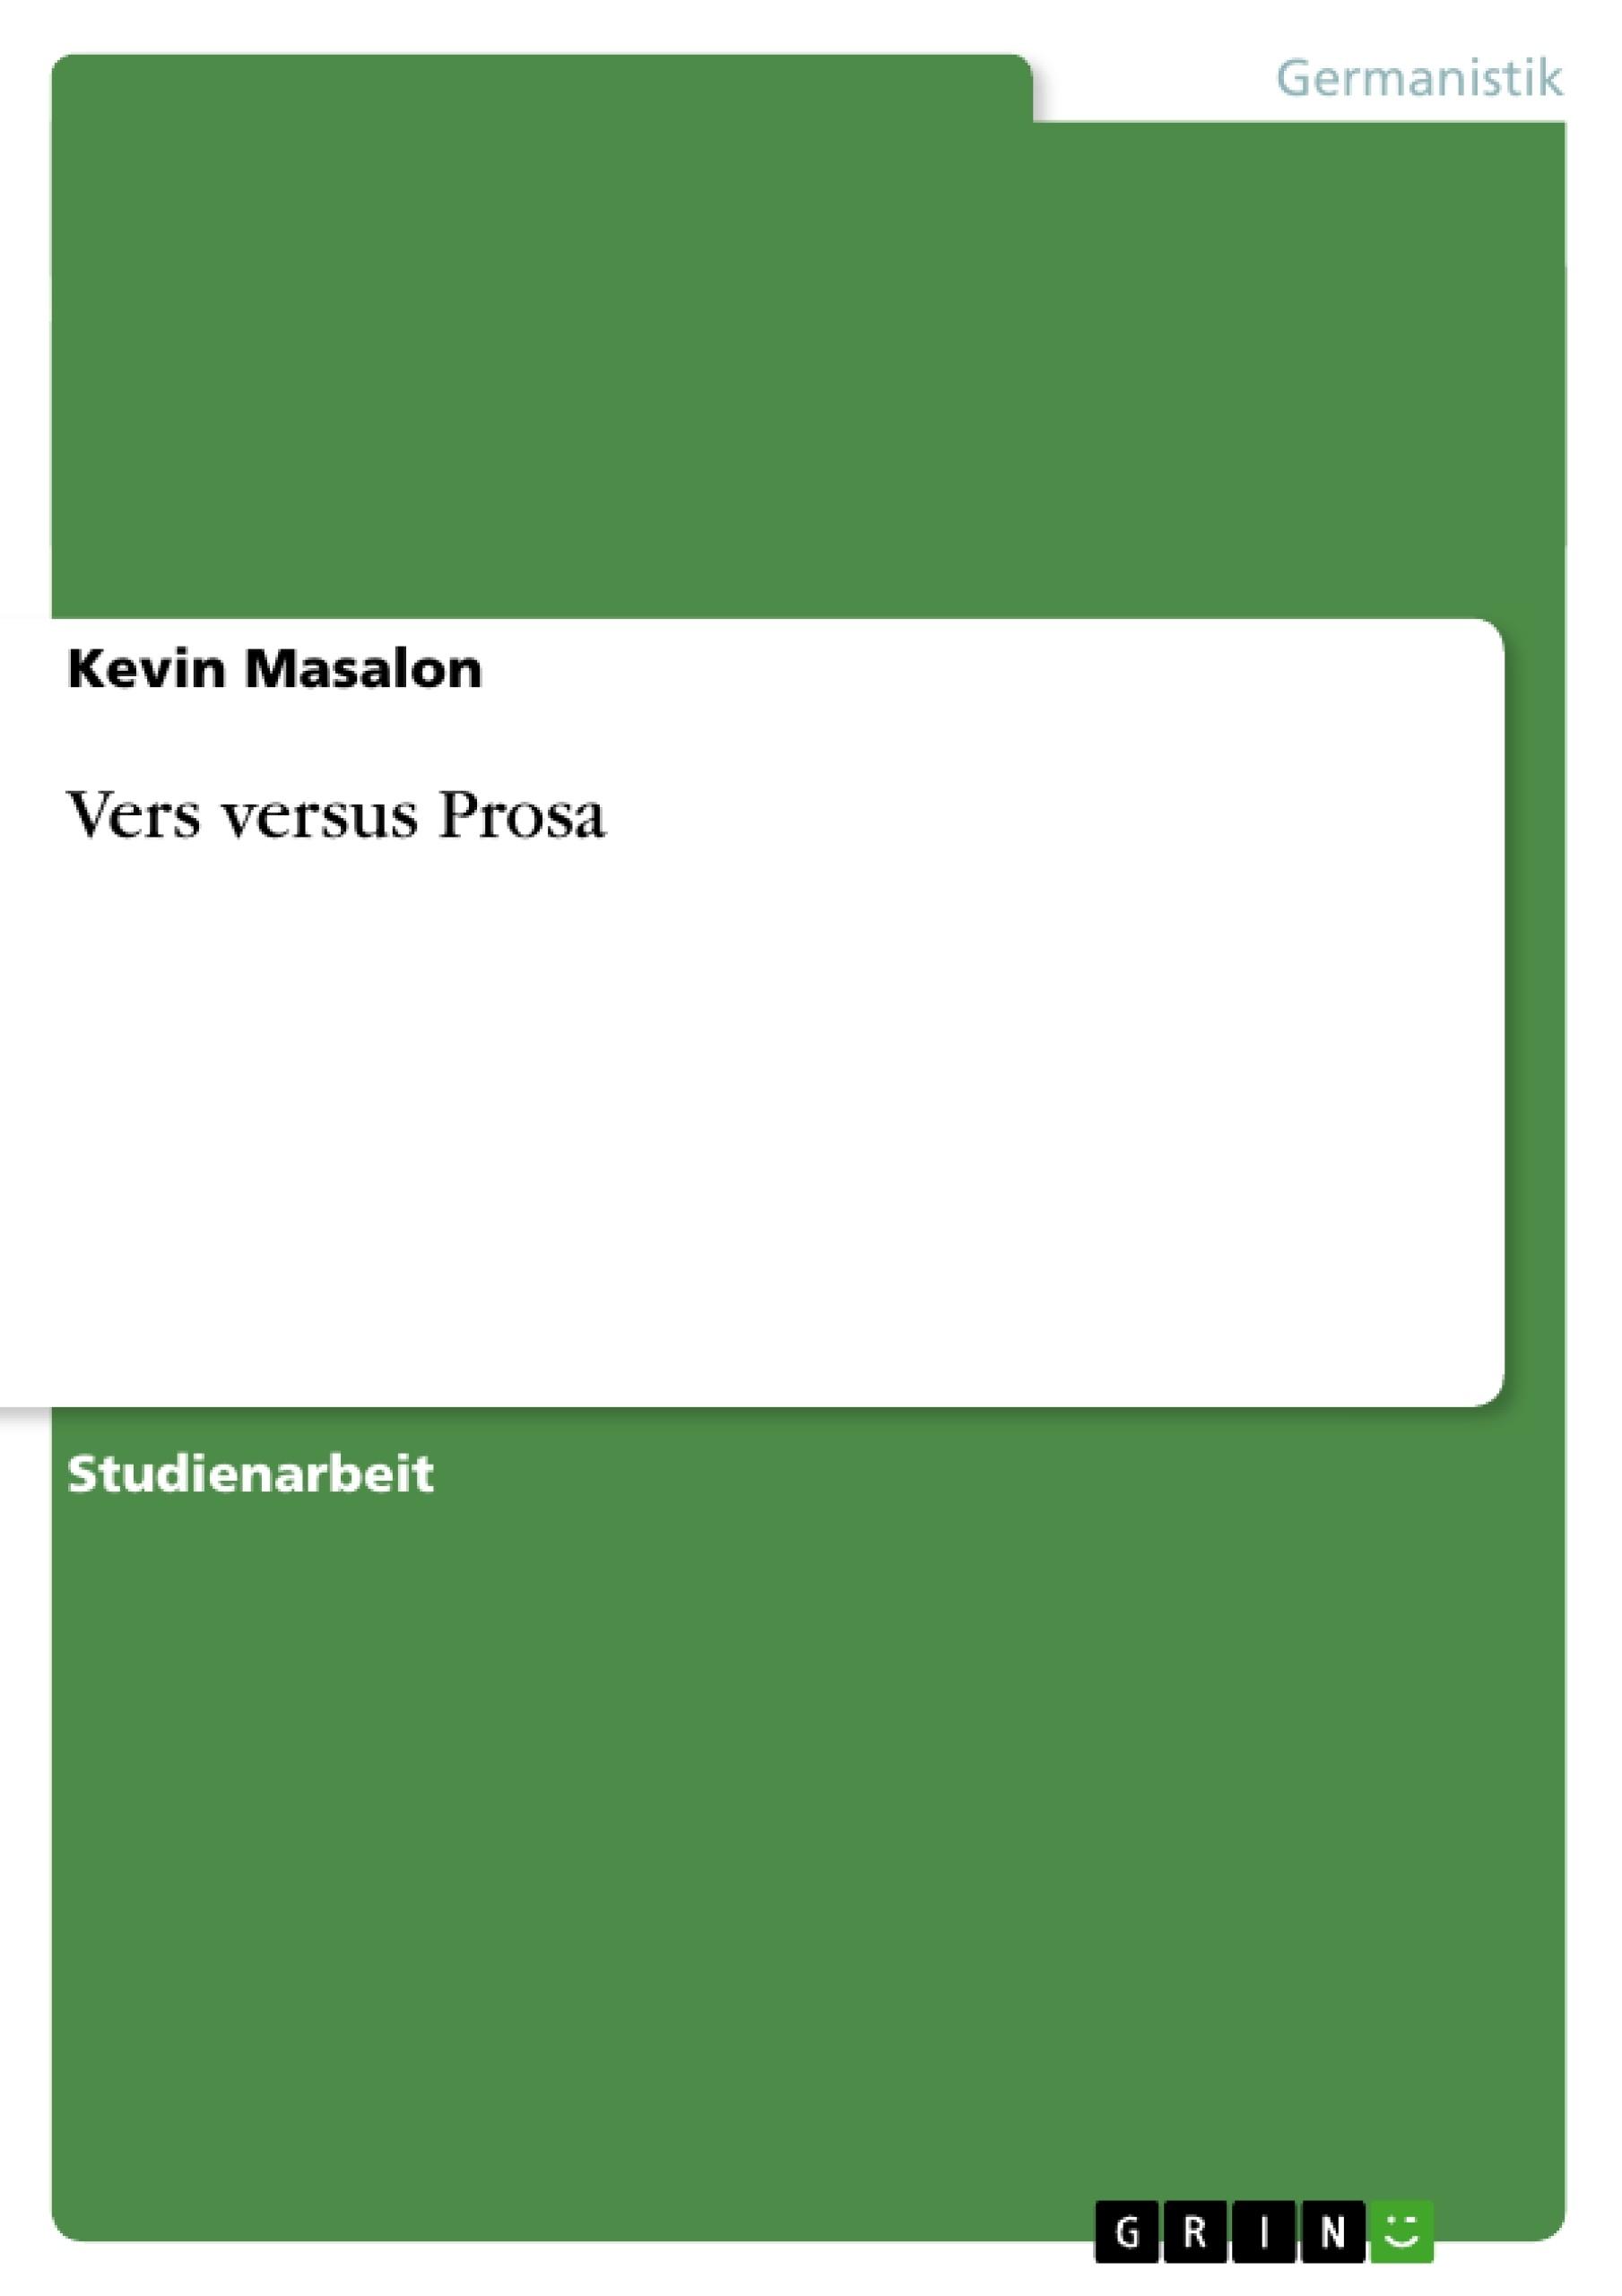 Titel: Vers versus Prosa